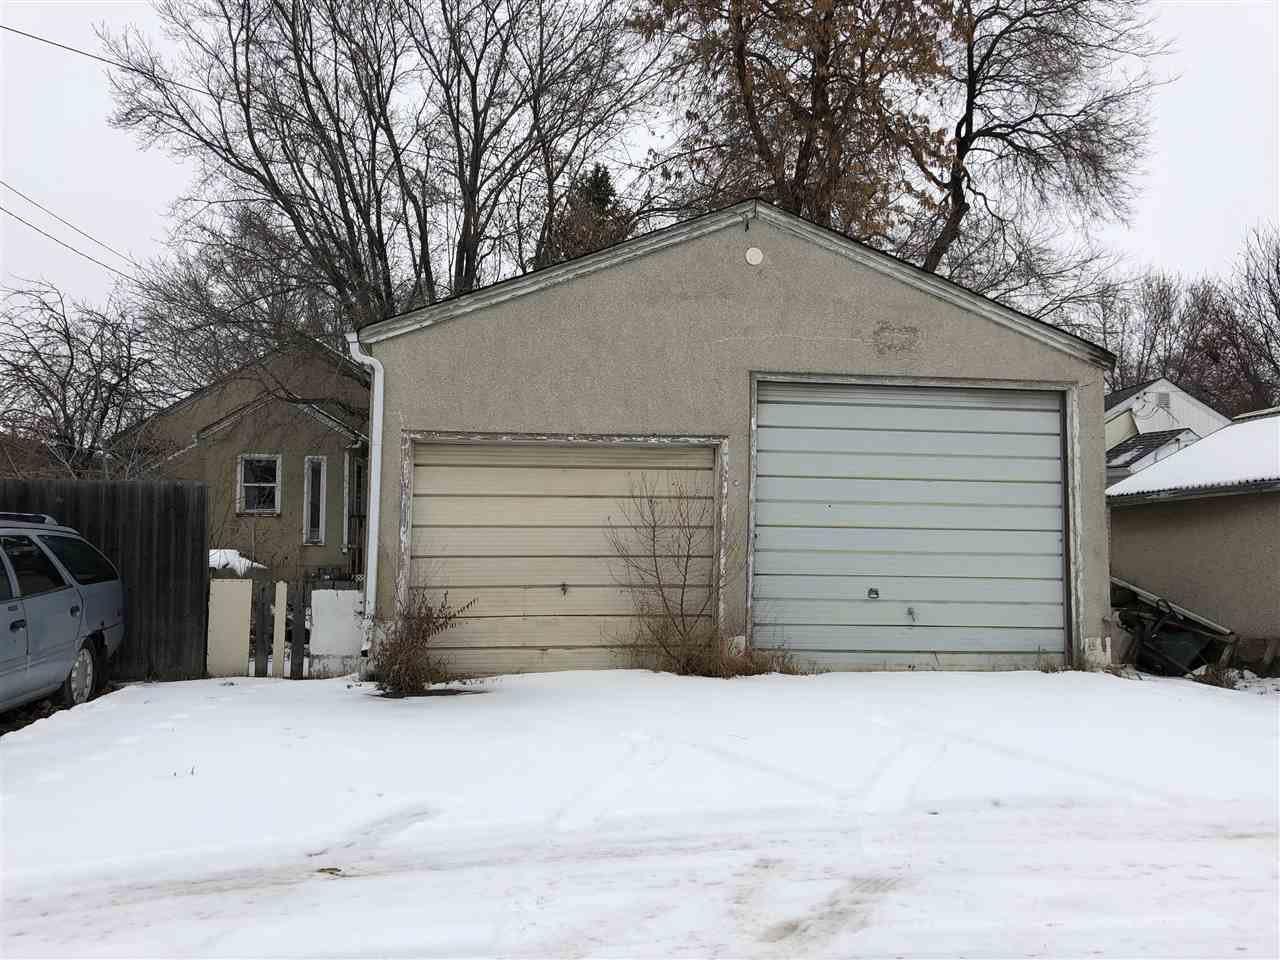 Photo 4: Photos: 12644 70 Street in Edmonton: Zone 02 House for sale : MLS®# E4179962